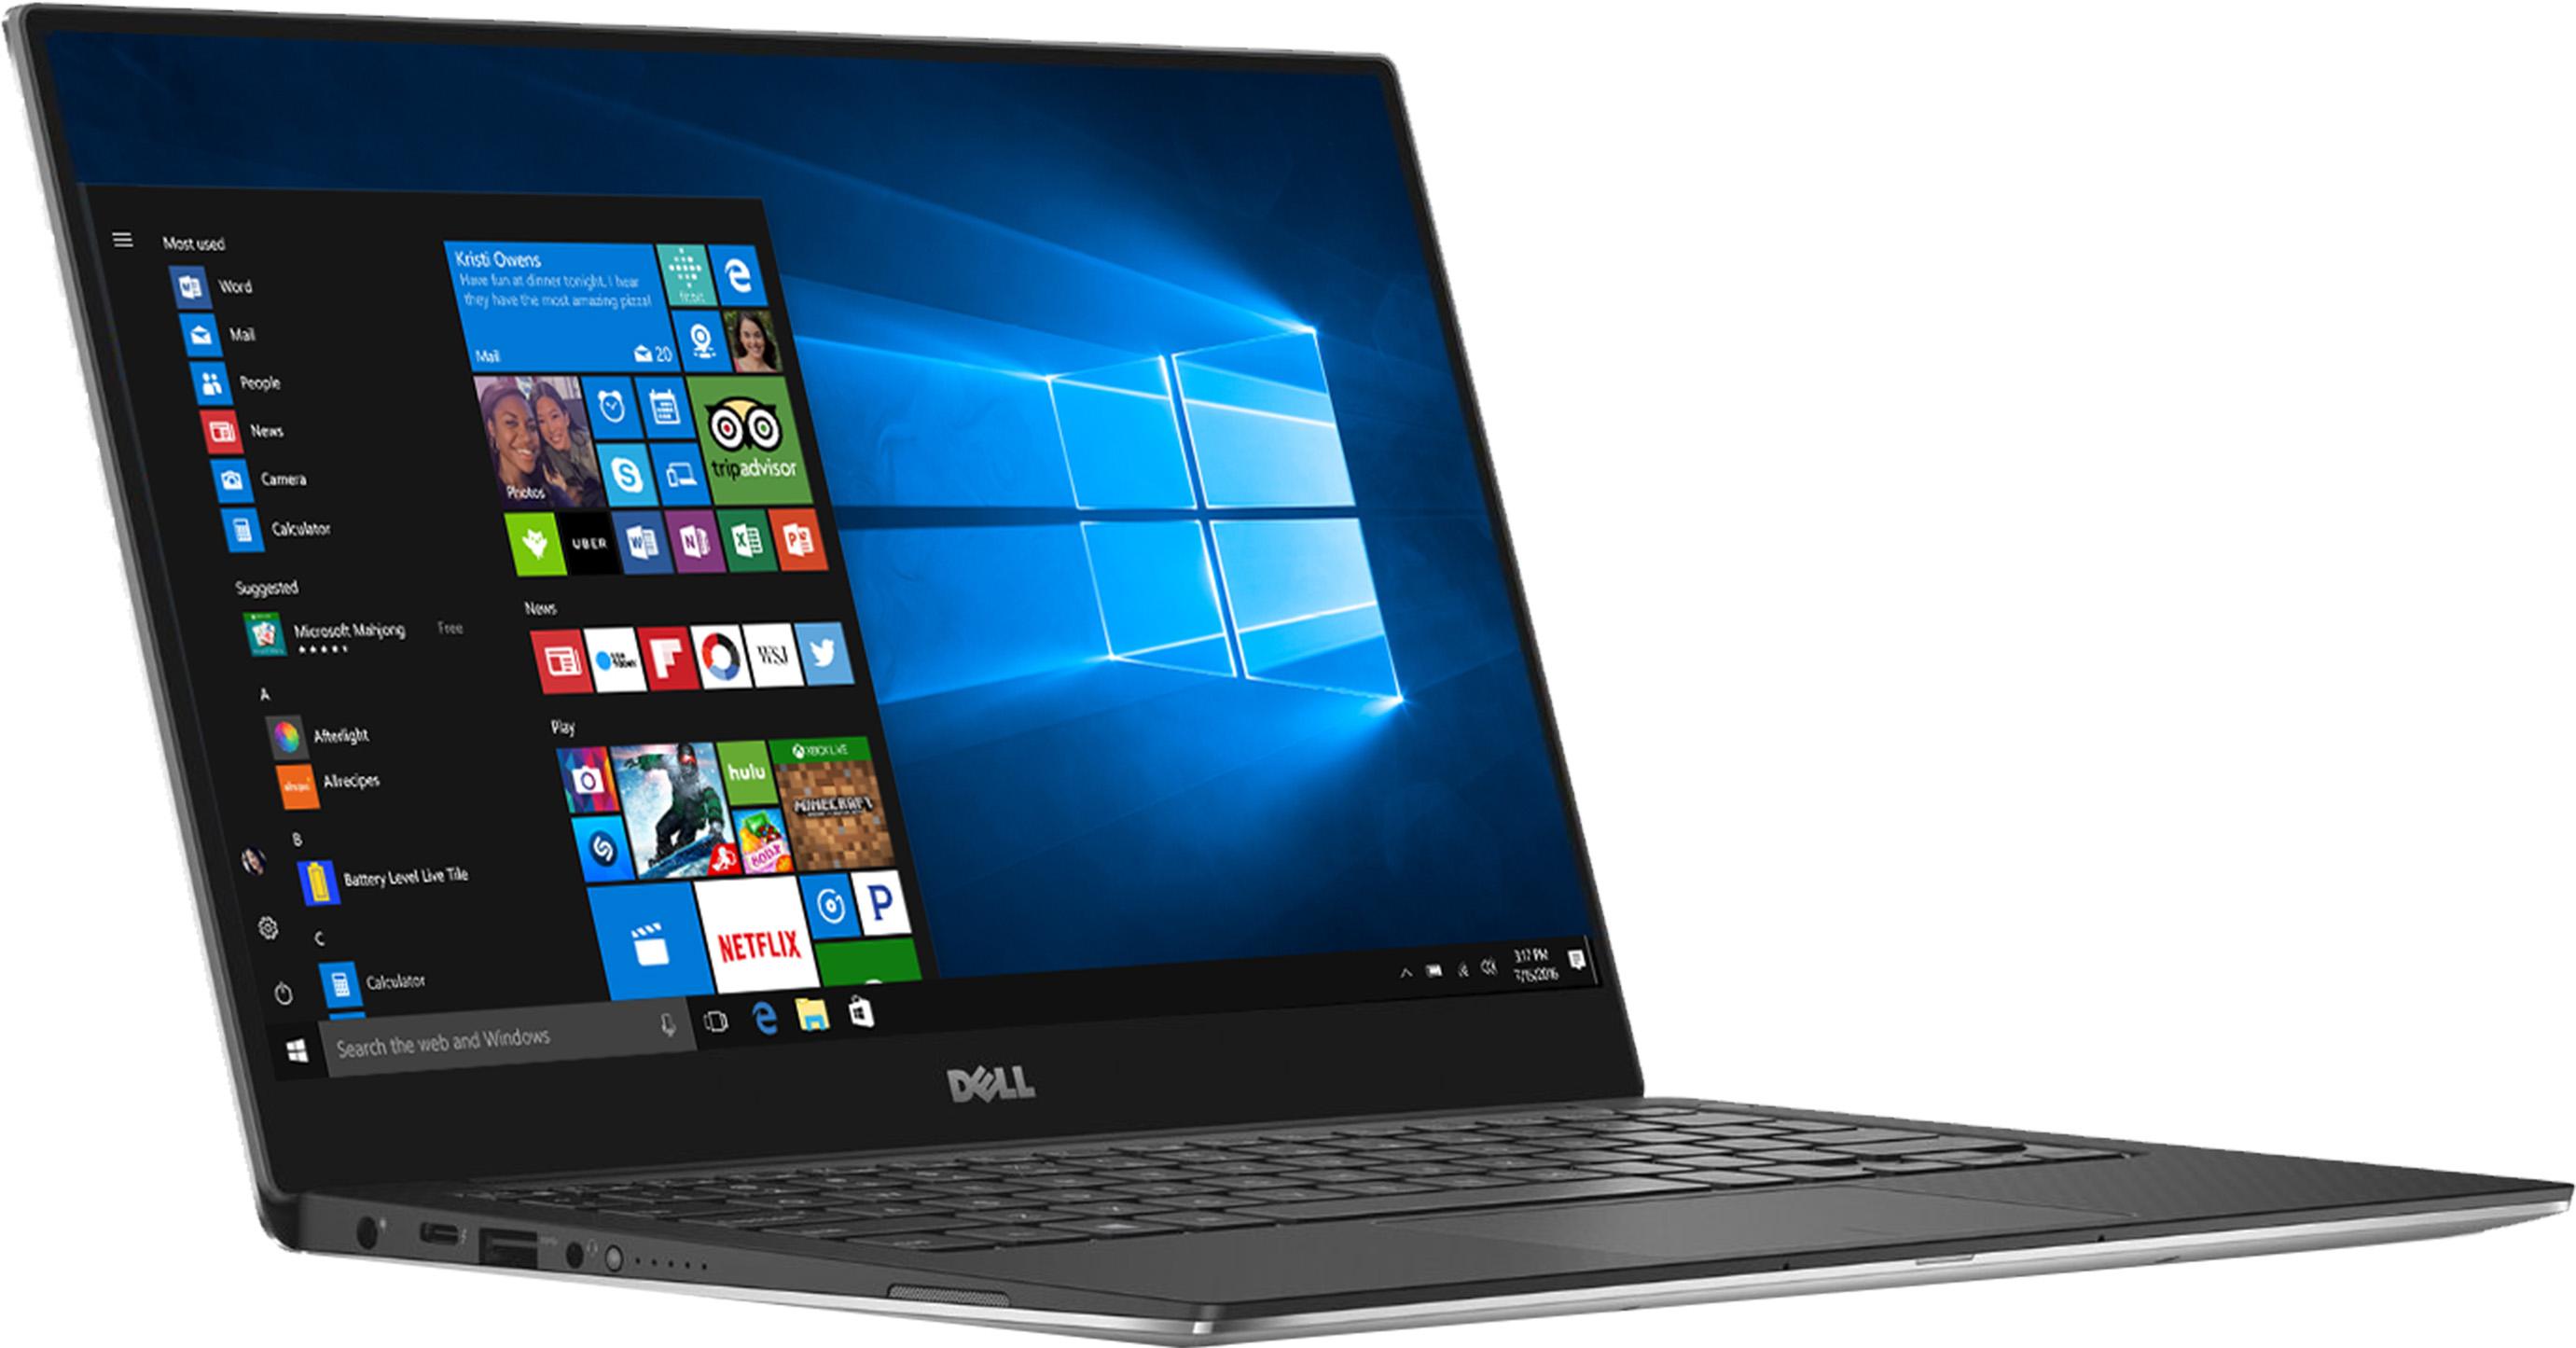 Dell XPS 13 XPS9360-1718SLV Signature Edition Laptop